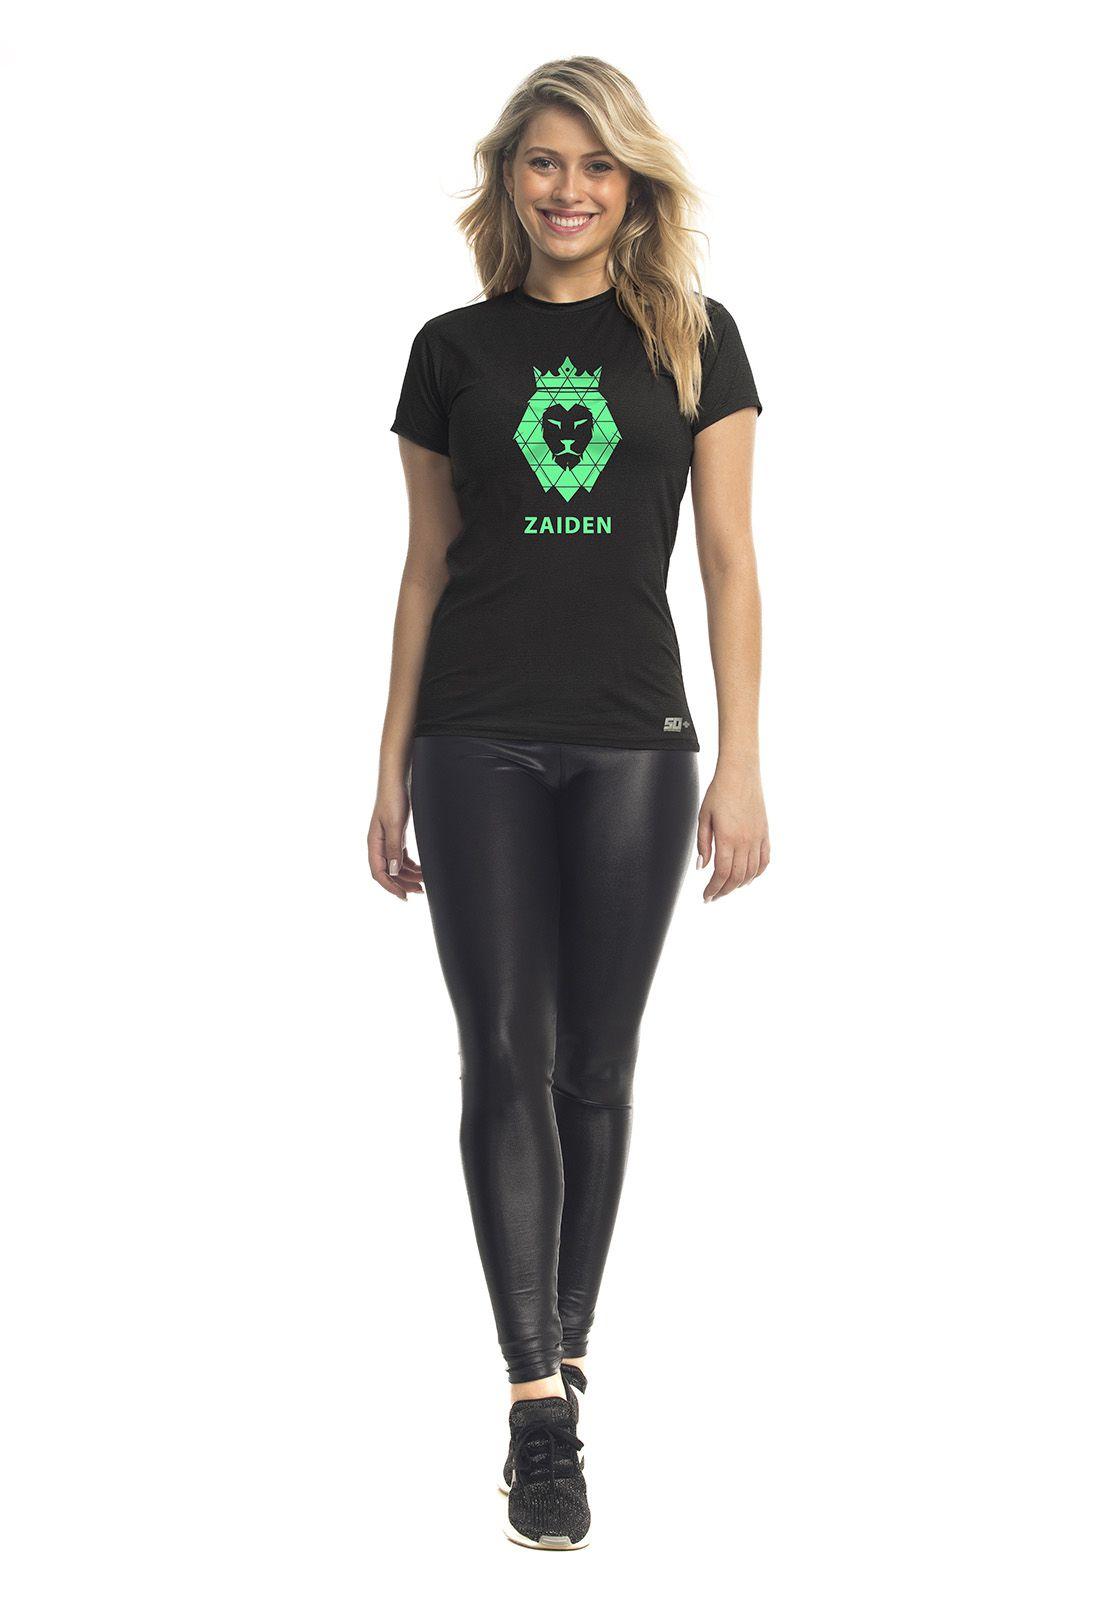 Camiseta Feminina Poliamida Preta Zaiden Leão Verde